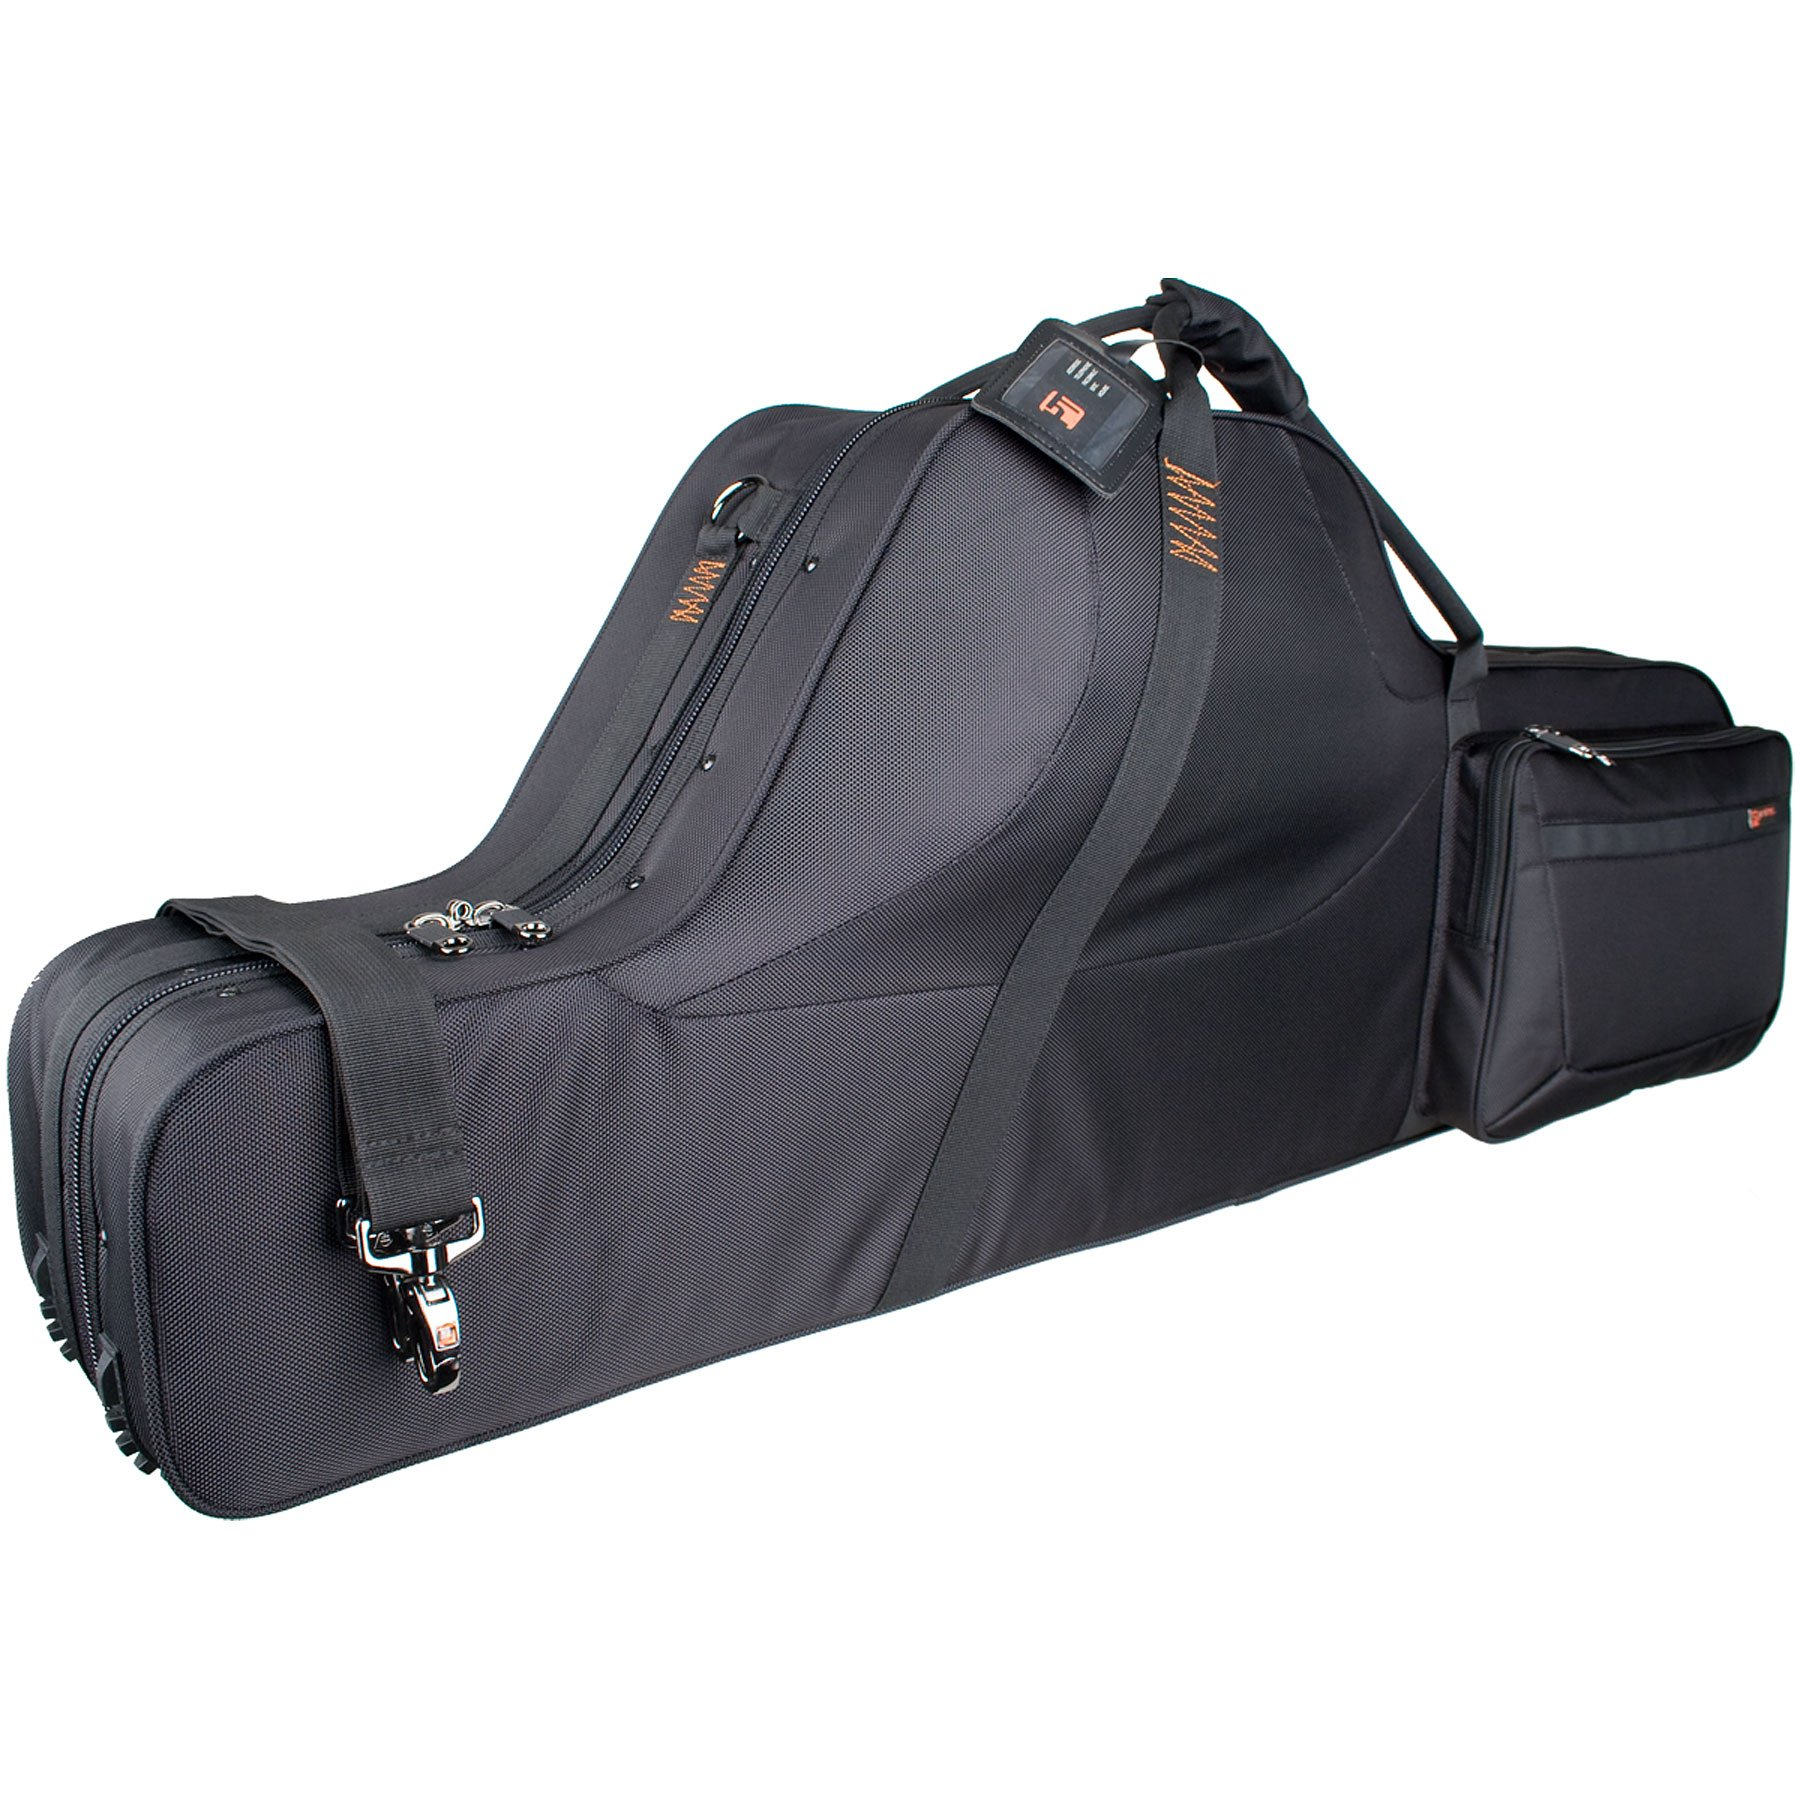 Protec Baritone Saxophone (Fits Low A & Bb) Contoured PRO PAC Case, Model PB311CT